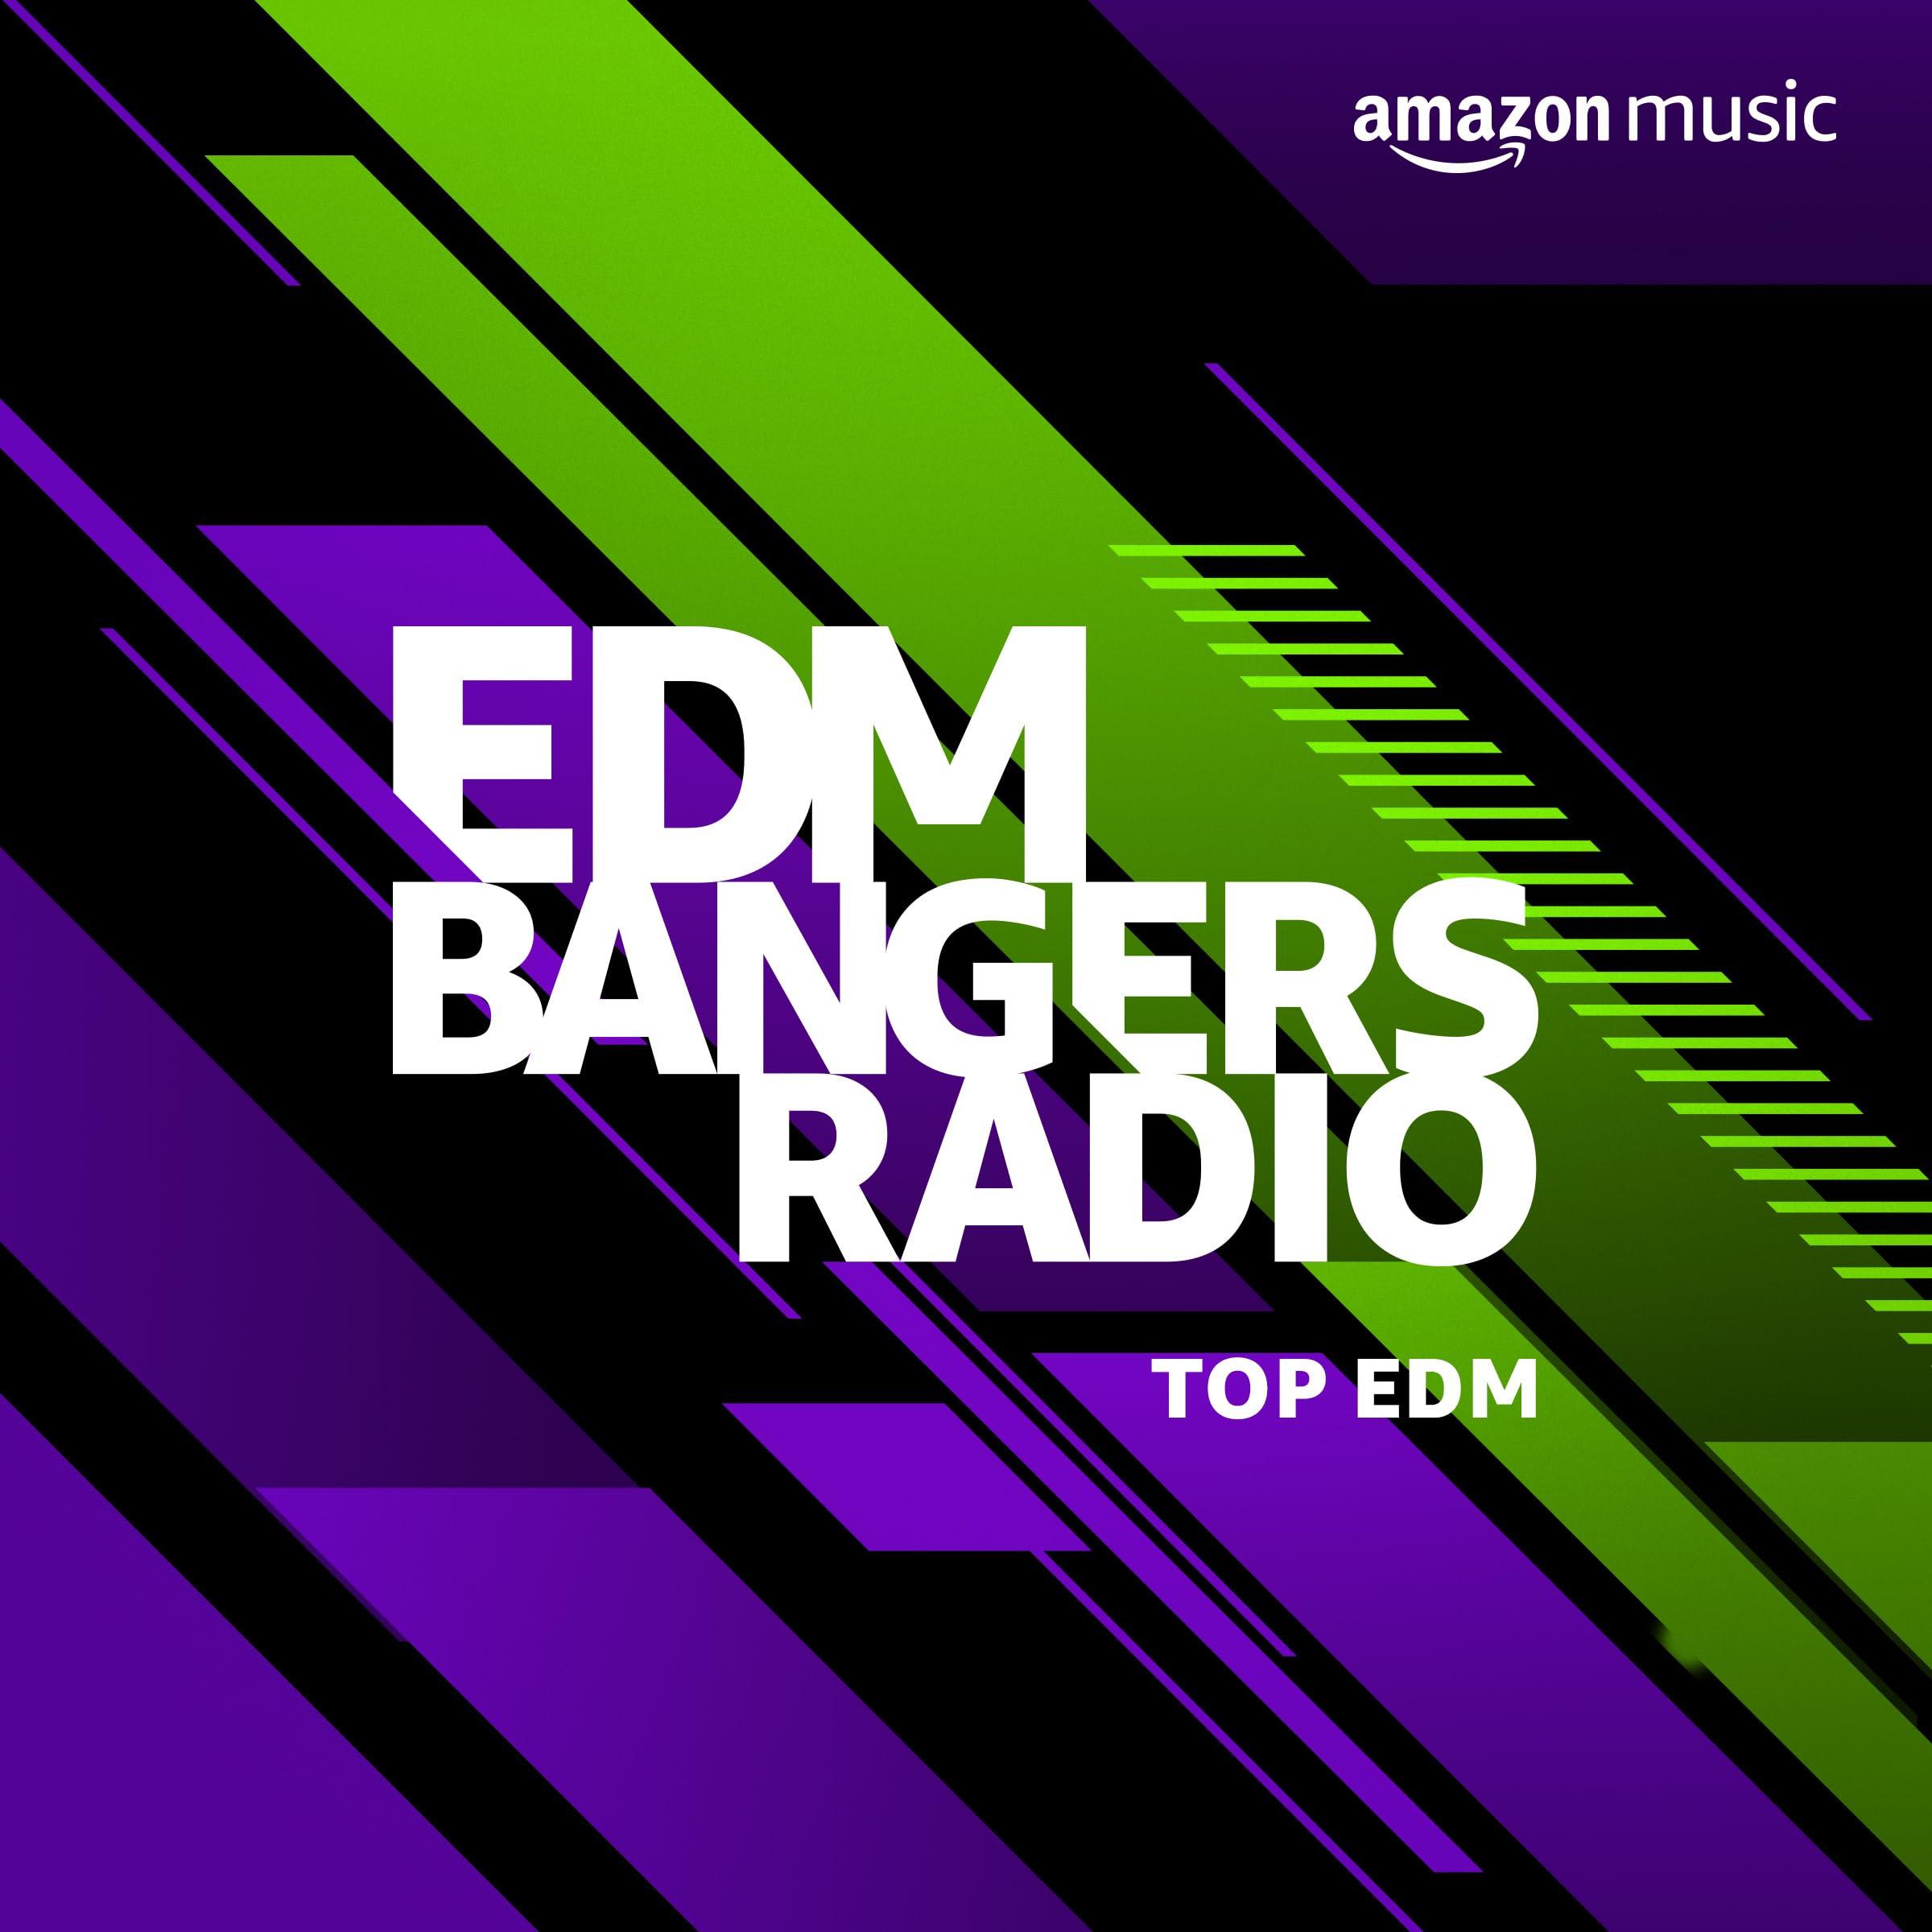 EDM Bangers Radio